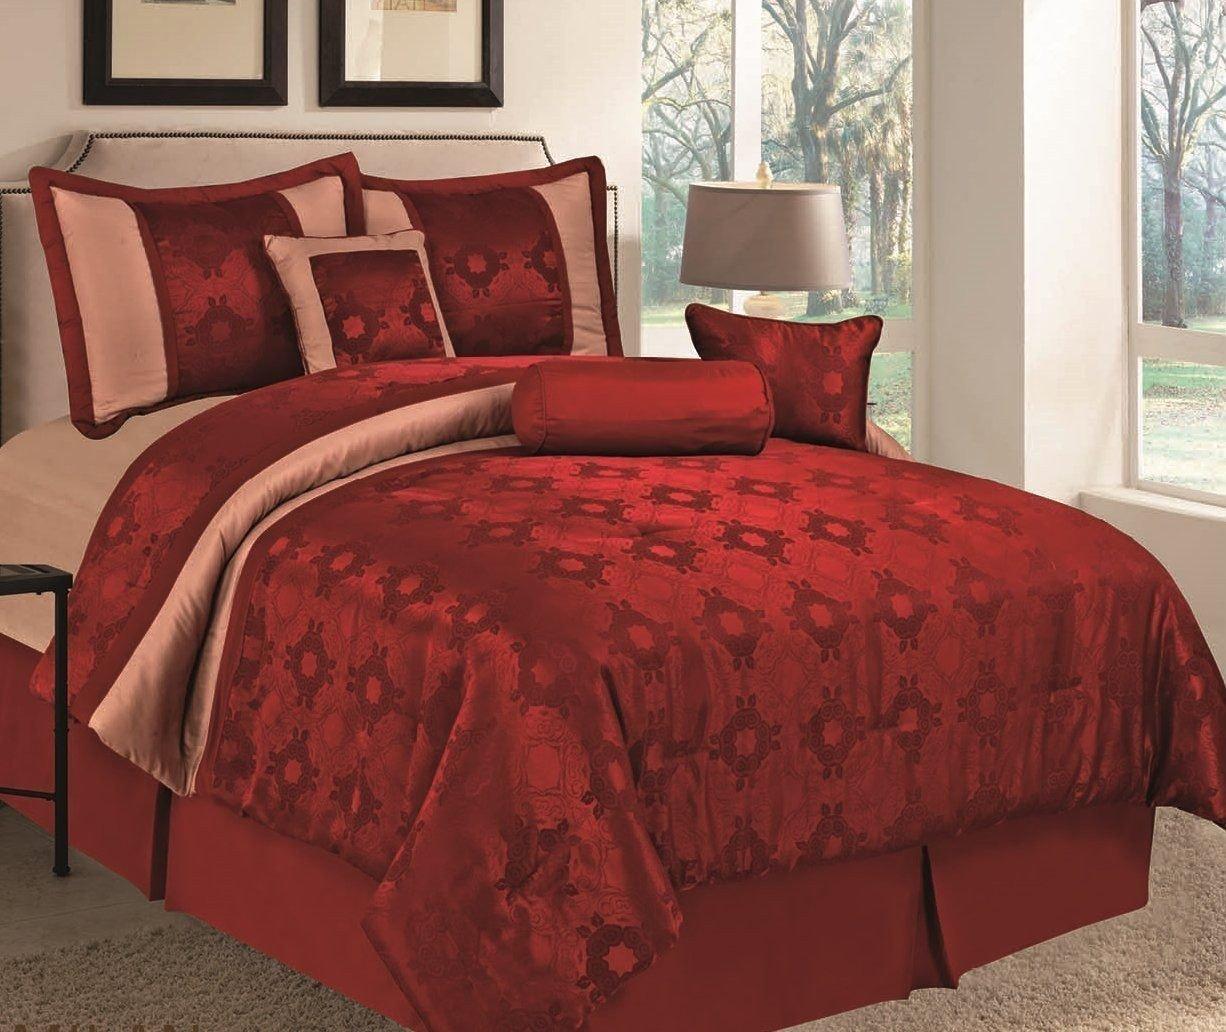 Bedroom Bedding and Curtain Set Beautiful 11 Piece Milan Burgundy Medallion Jacquard forter Set